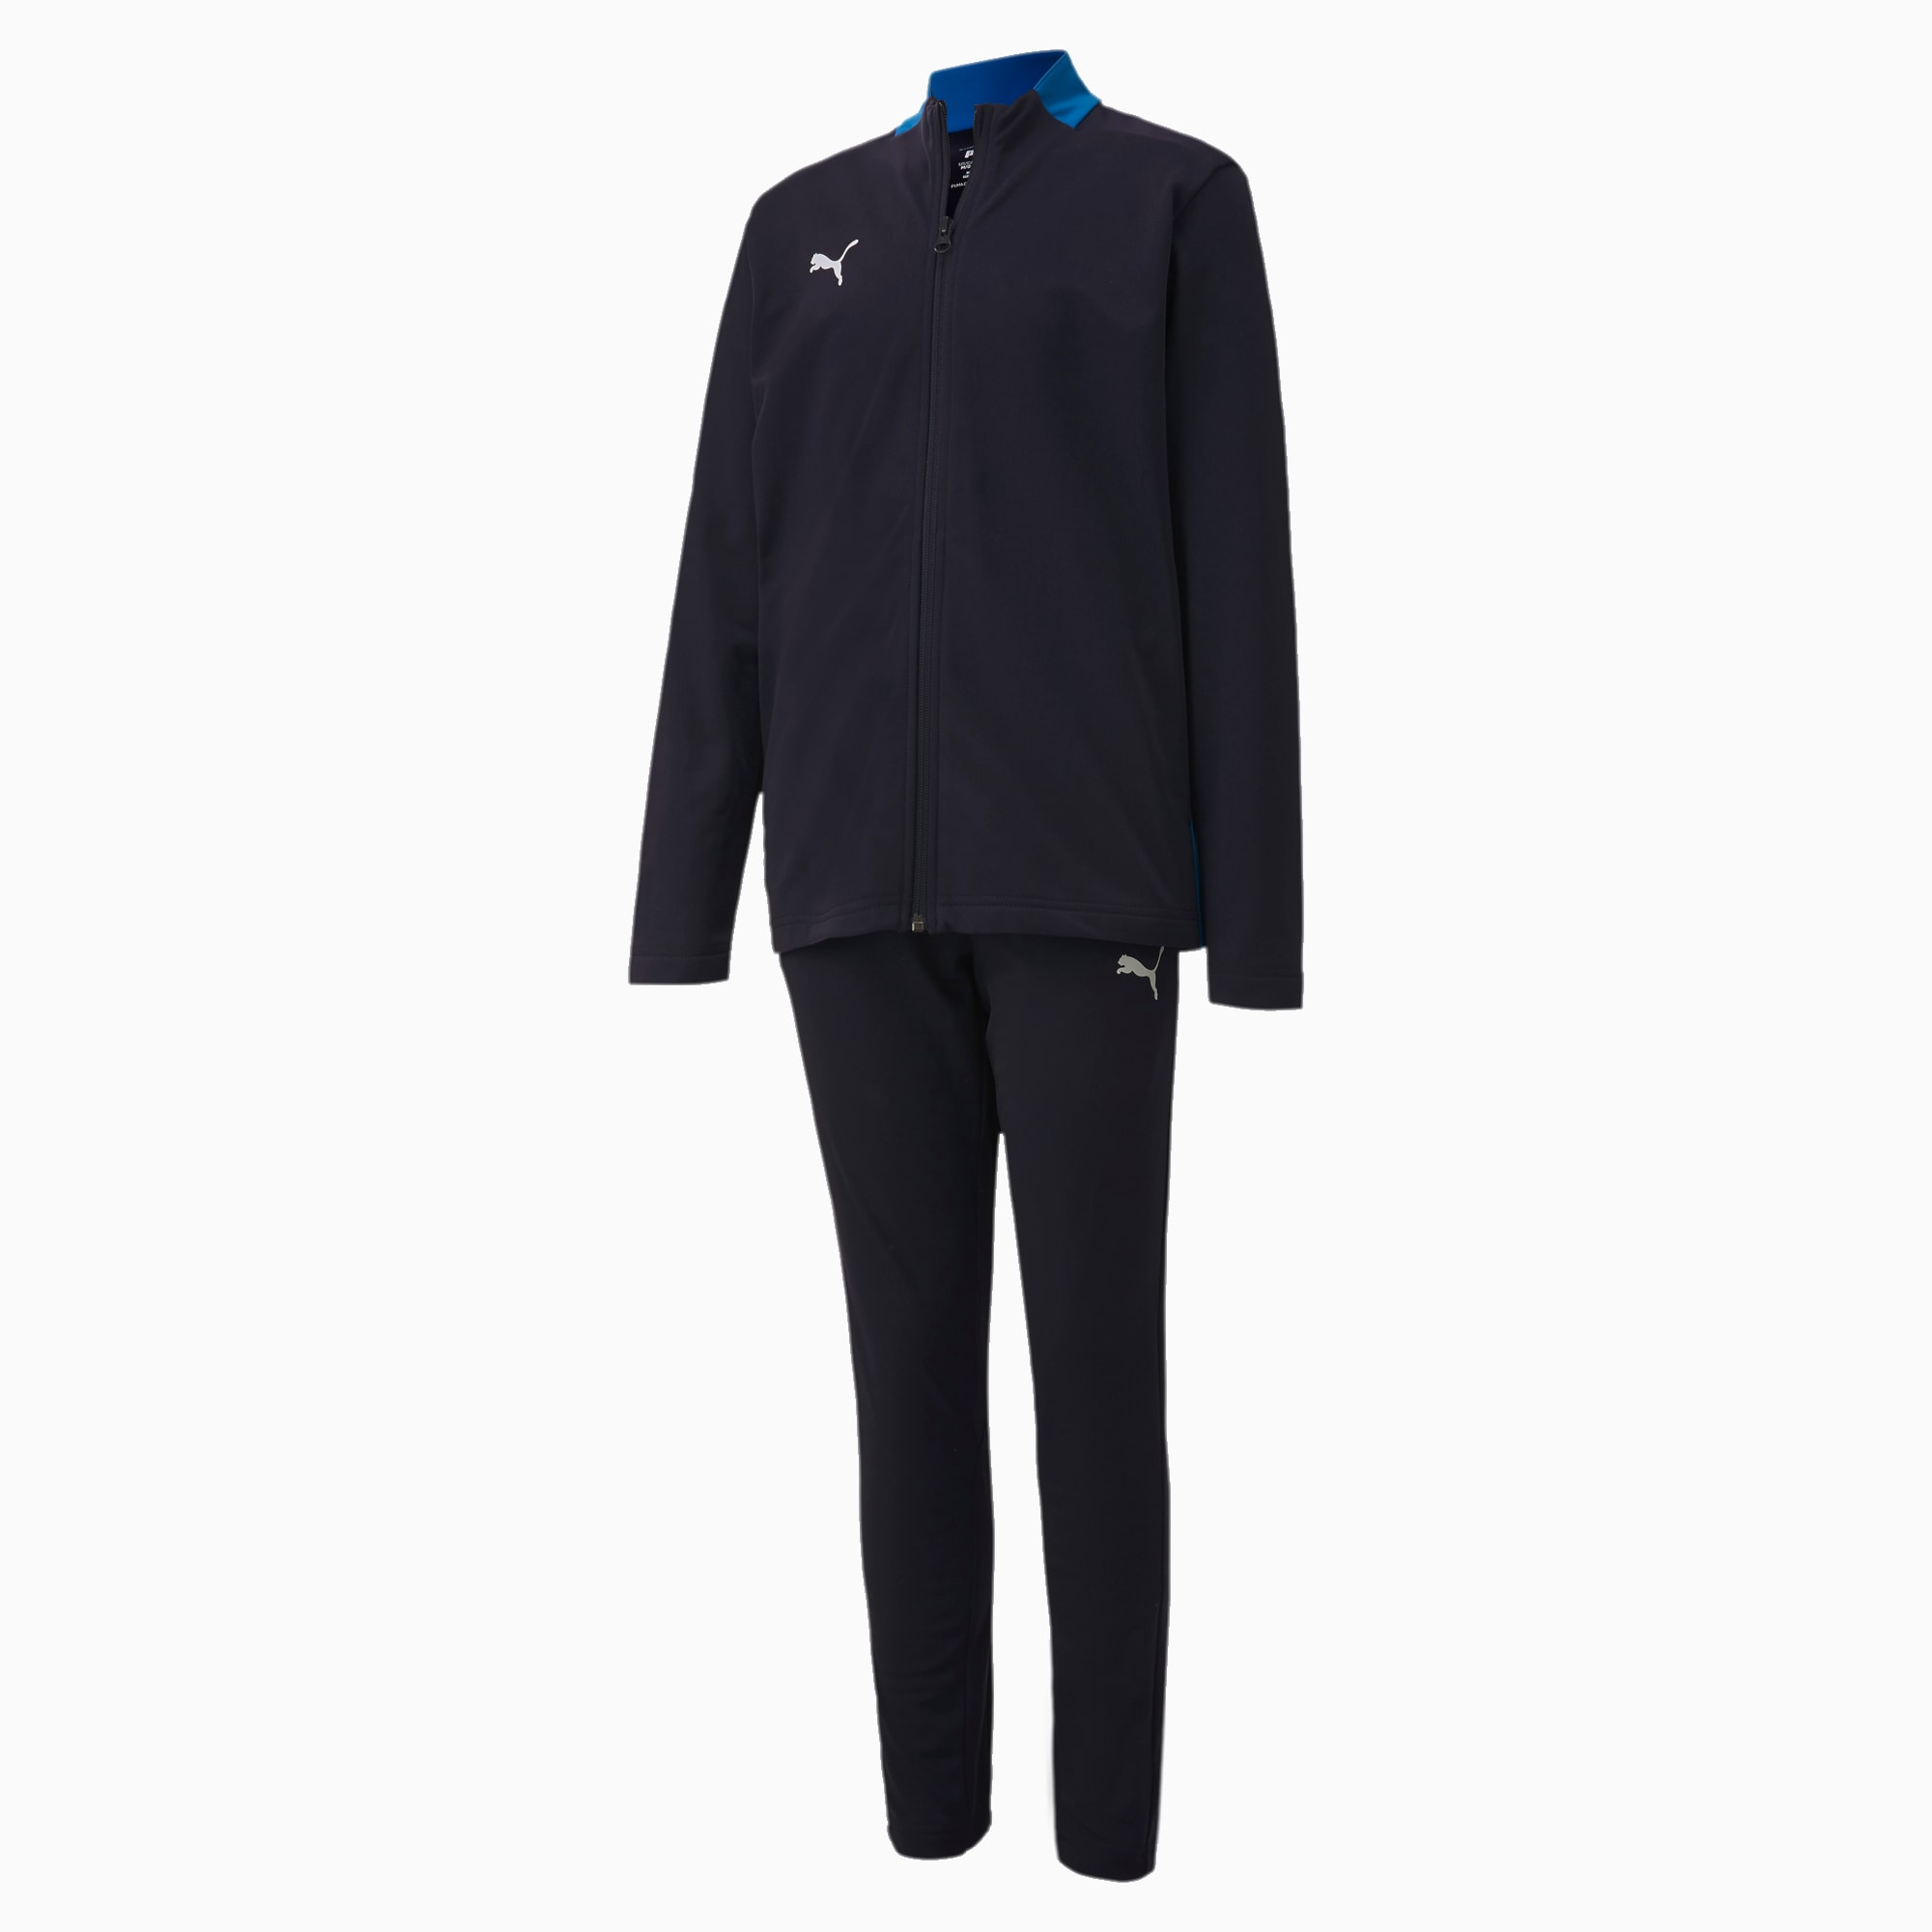 Image of PUMA ftblPLAY Youth Trainingsanzug Für Kinder | Mit Aucun | Blau | Größe: 104